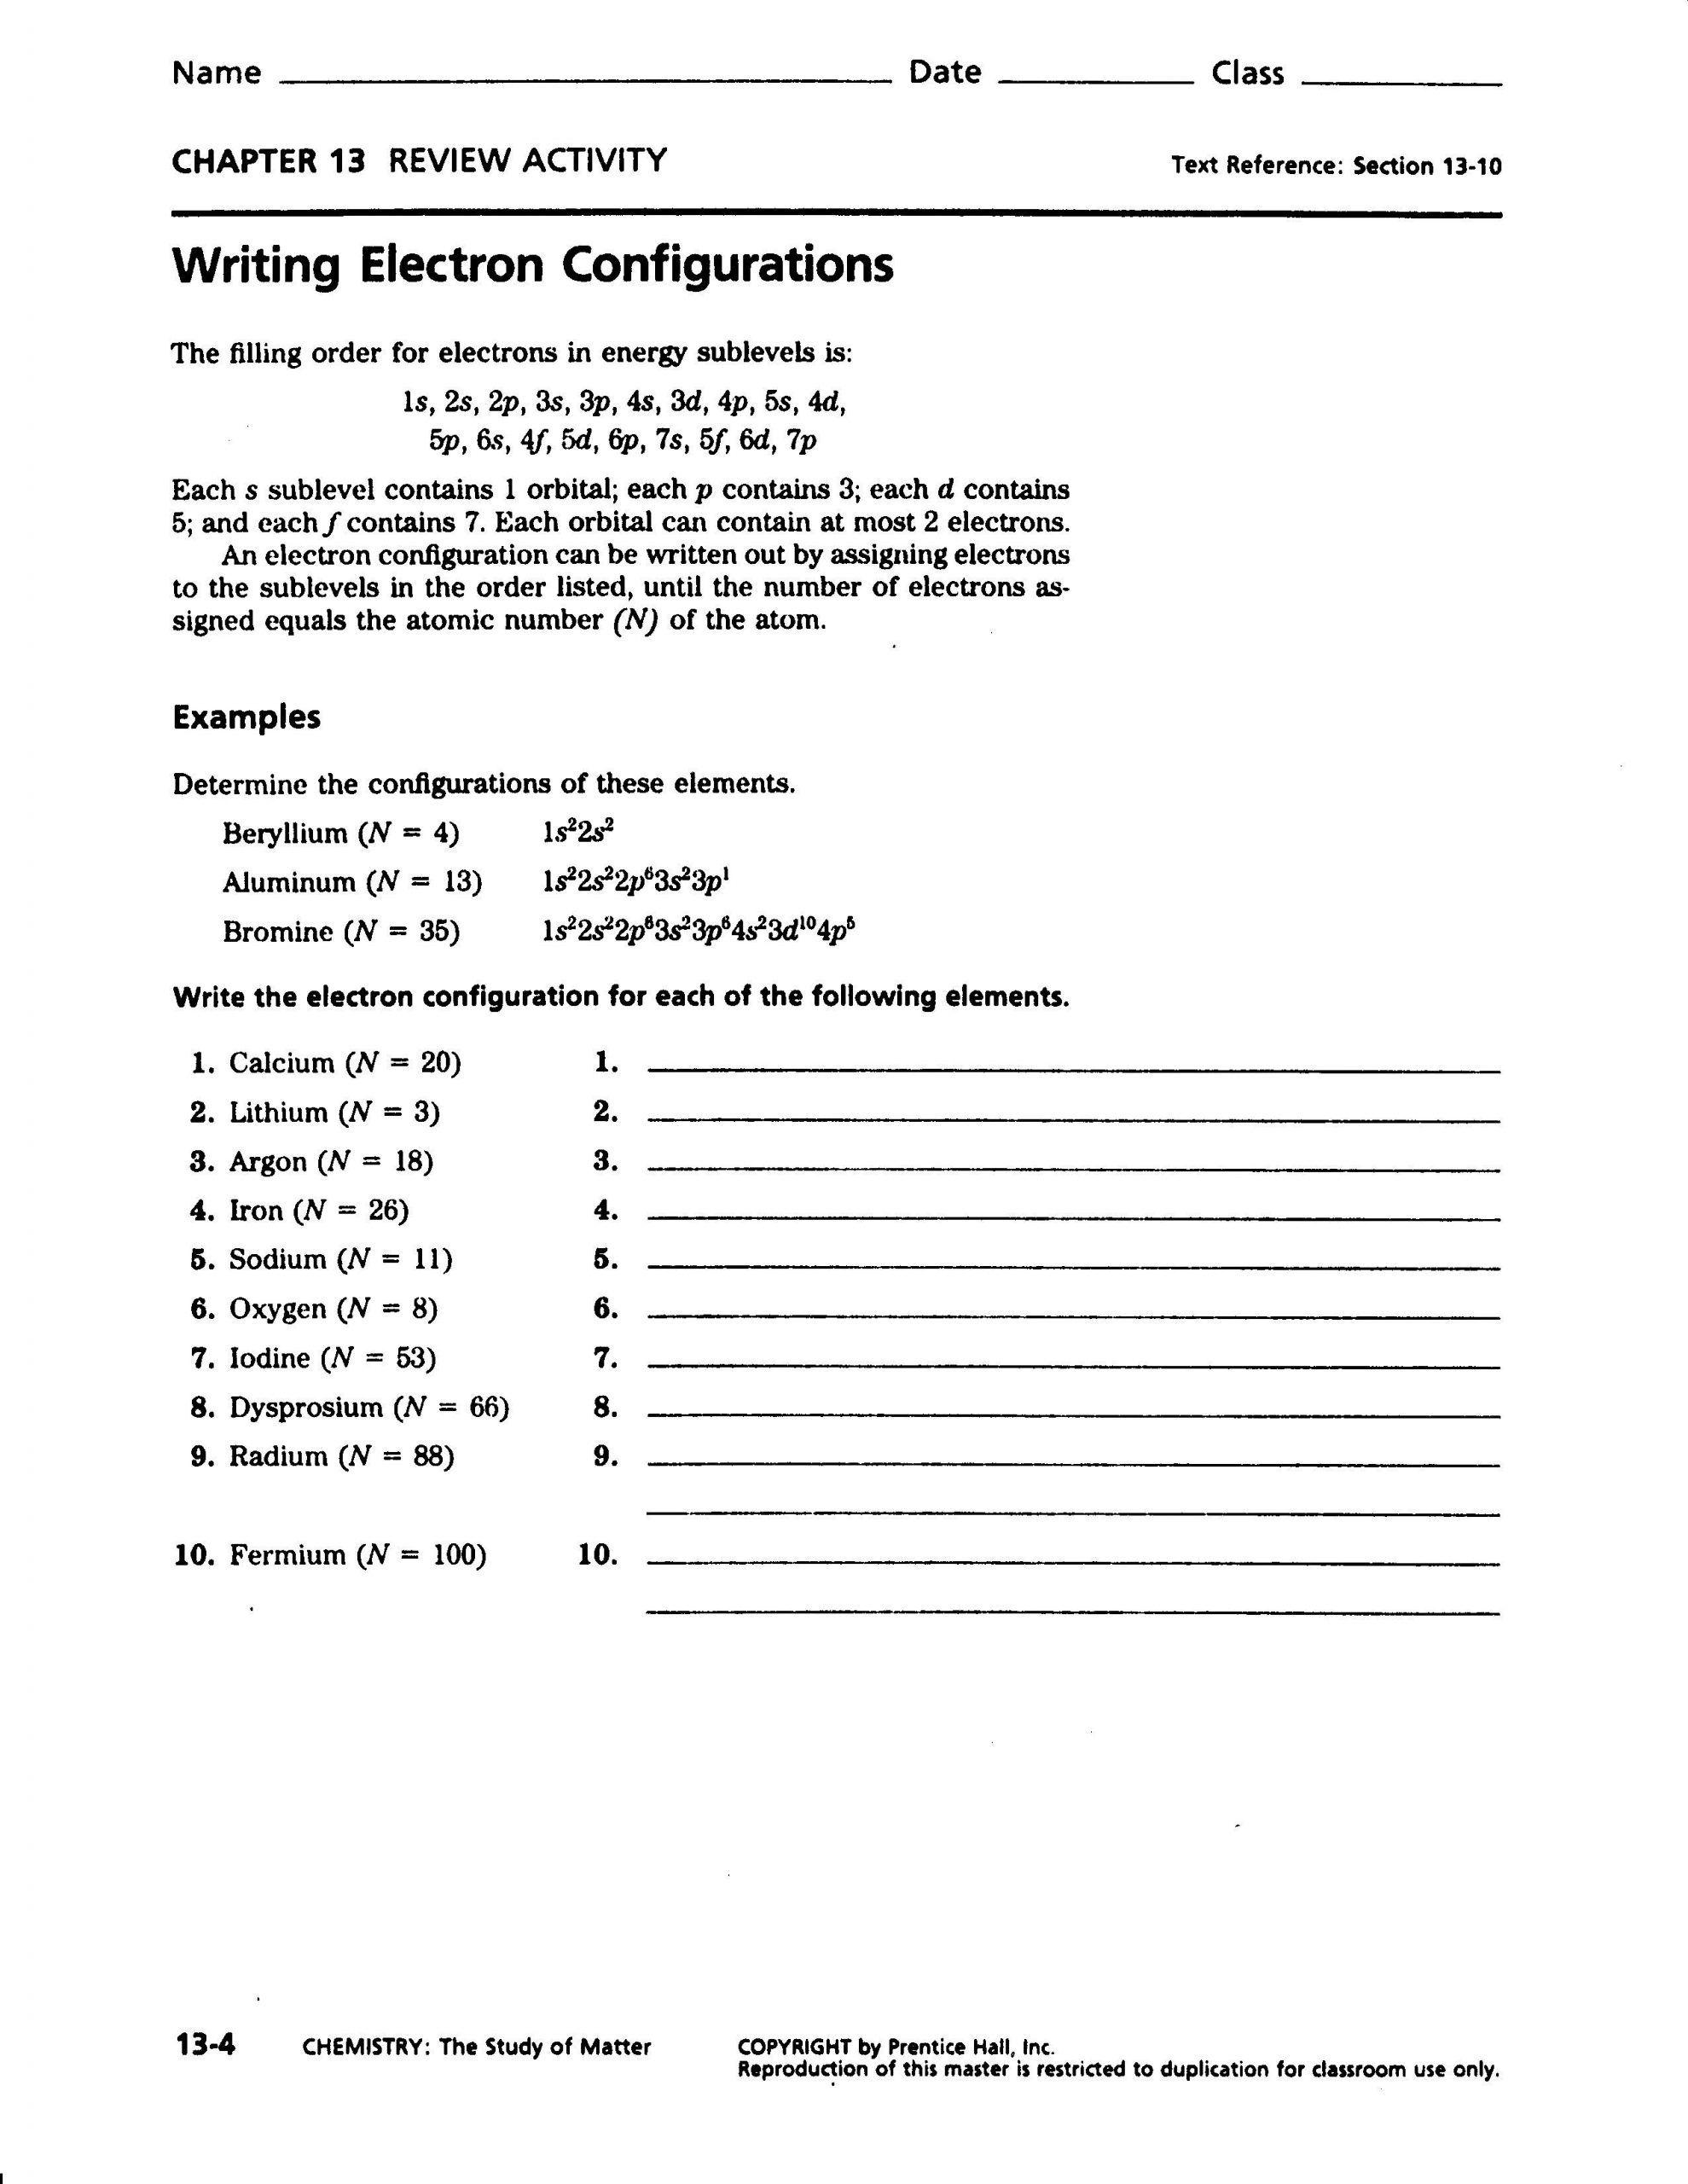 Electron Configuration Worksheet Answer Key Electron Configuration Worksheet Answers Part A Works In 2020 Chemistry Worksheets Electron Configuration Matter Worksheets